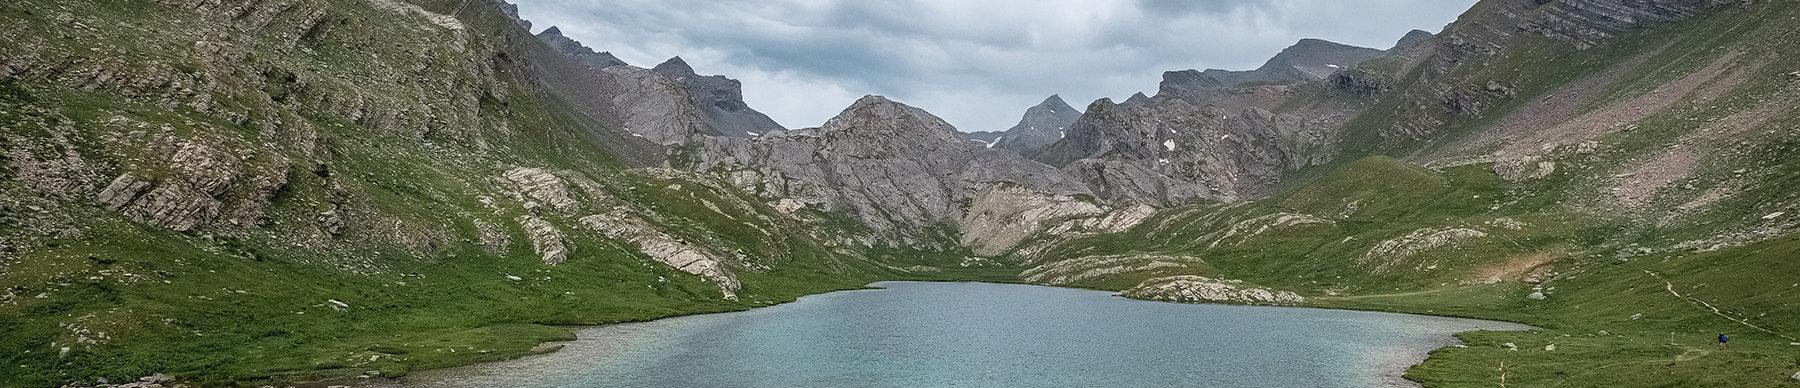 Lac du Lauzanier ©AD04-Teddy Verneuil